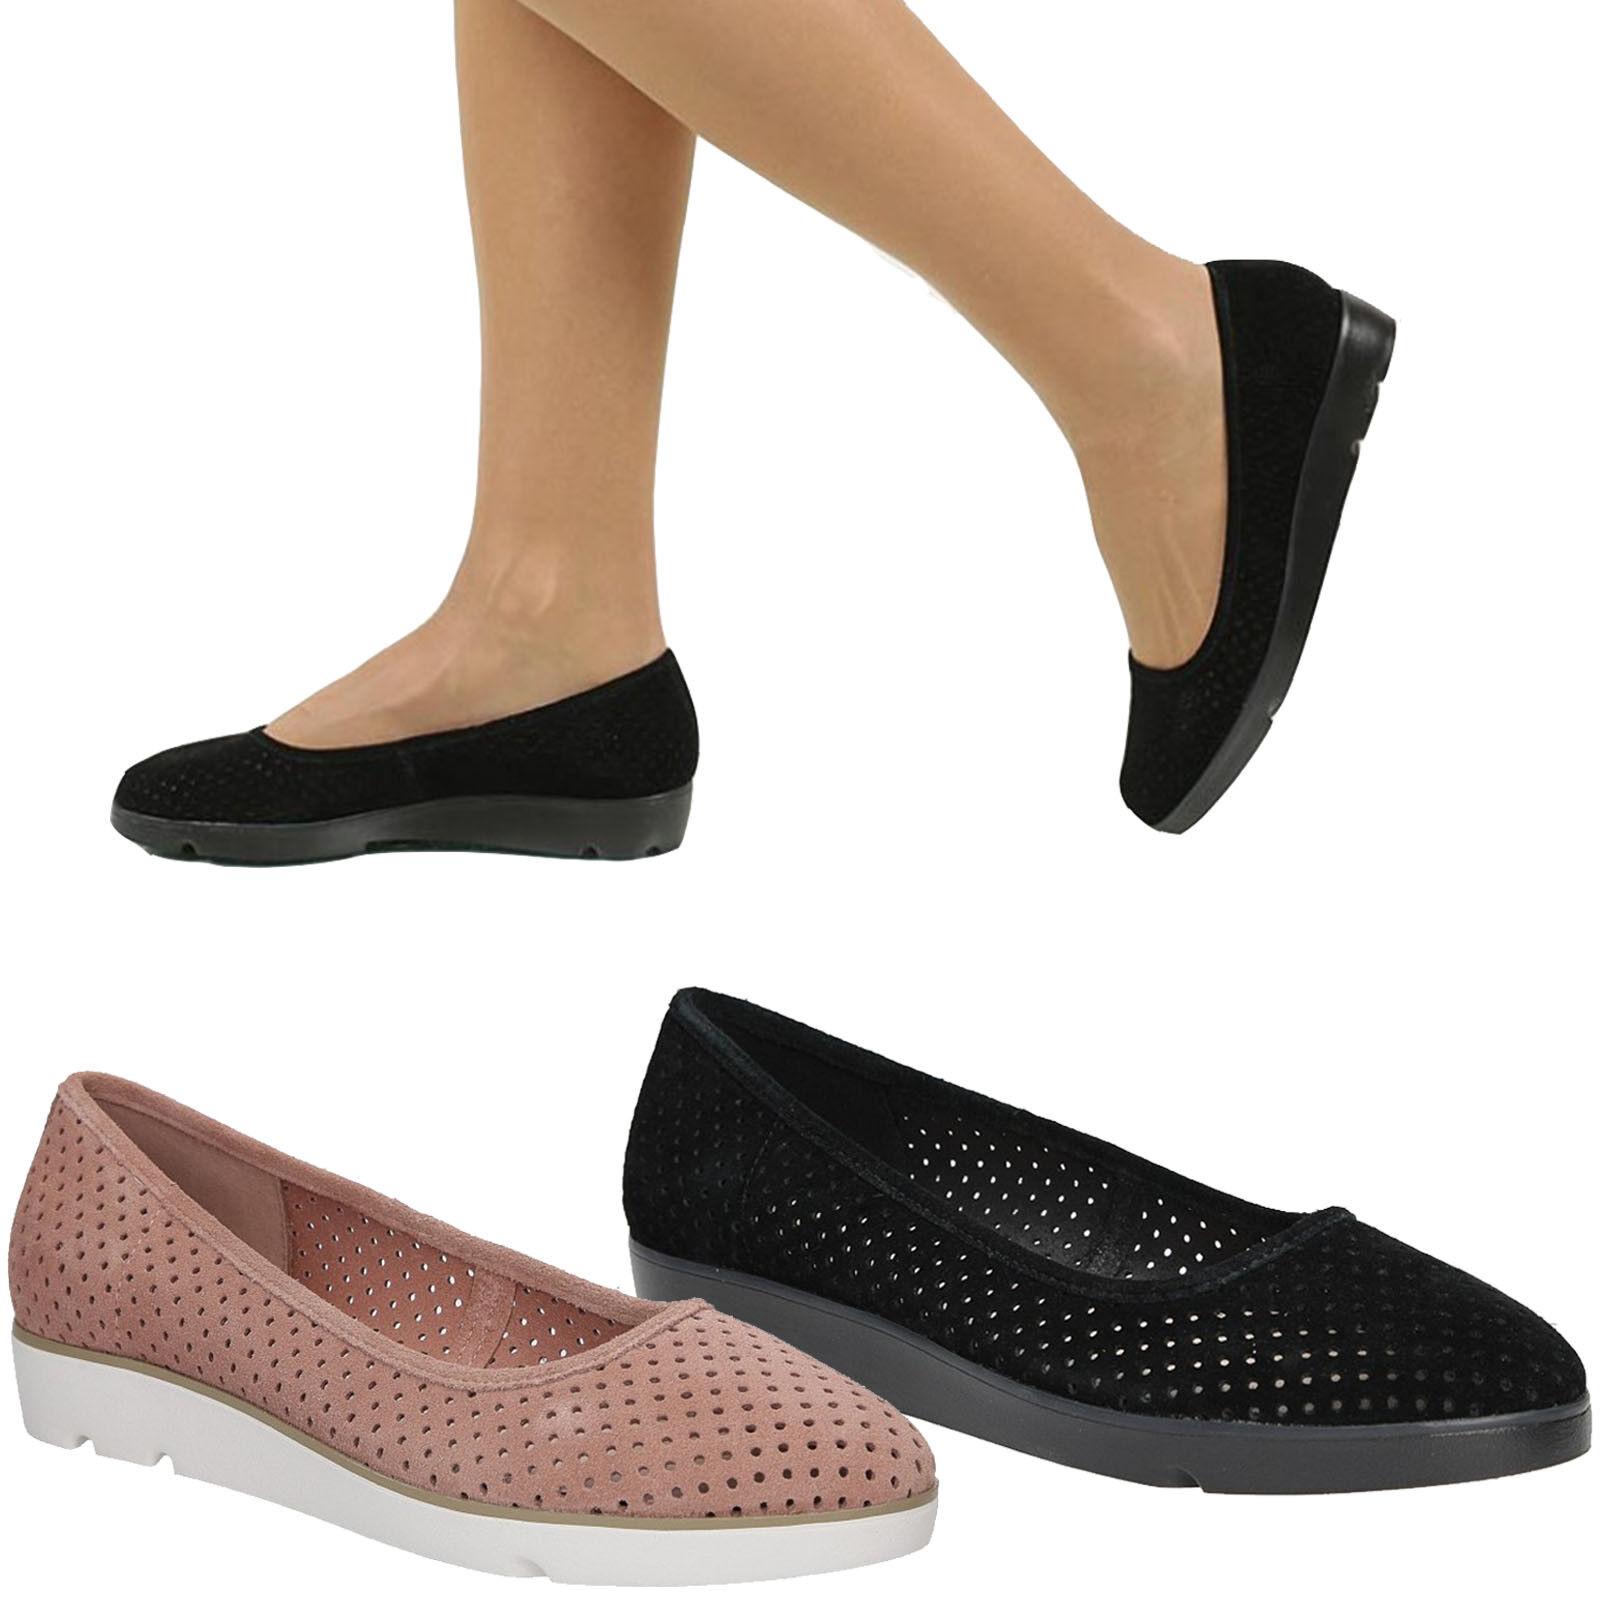 Señora bailarinas Clarks zapato zapato zapato bajo cómomujerte a la moda zapatos talla 36-41 sale  caliente